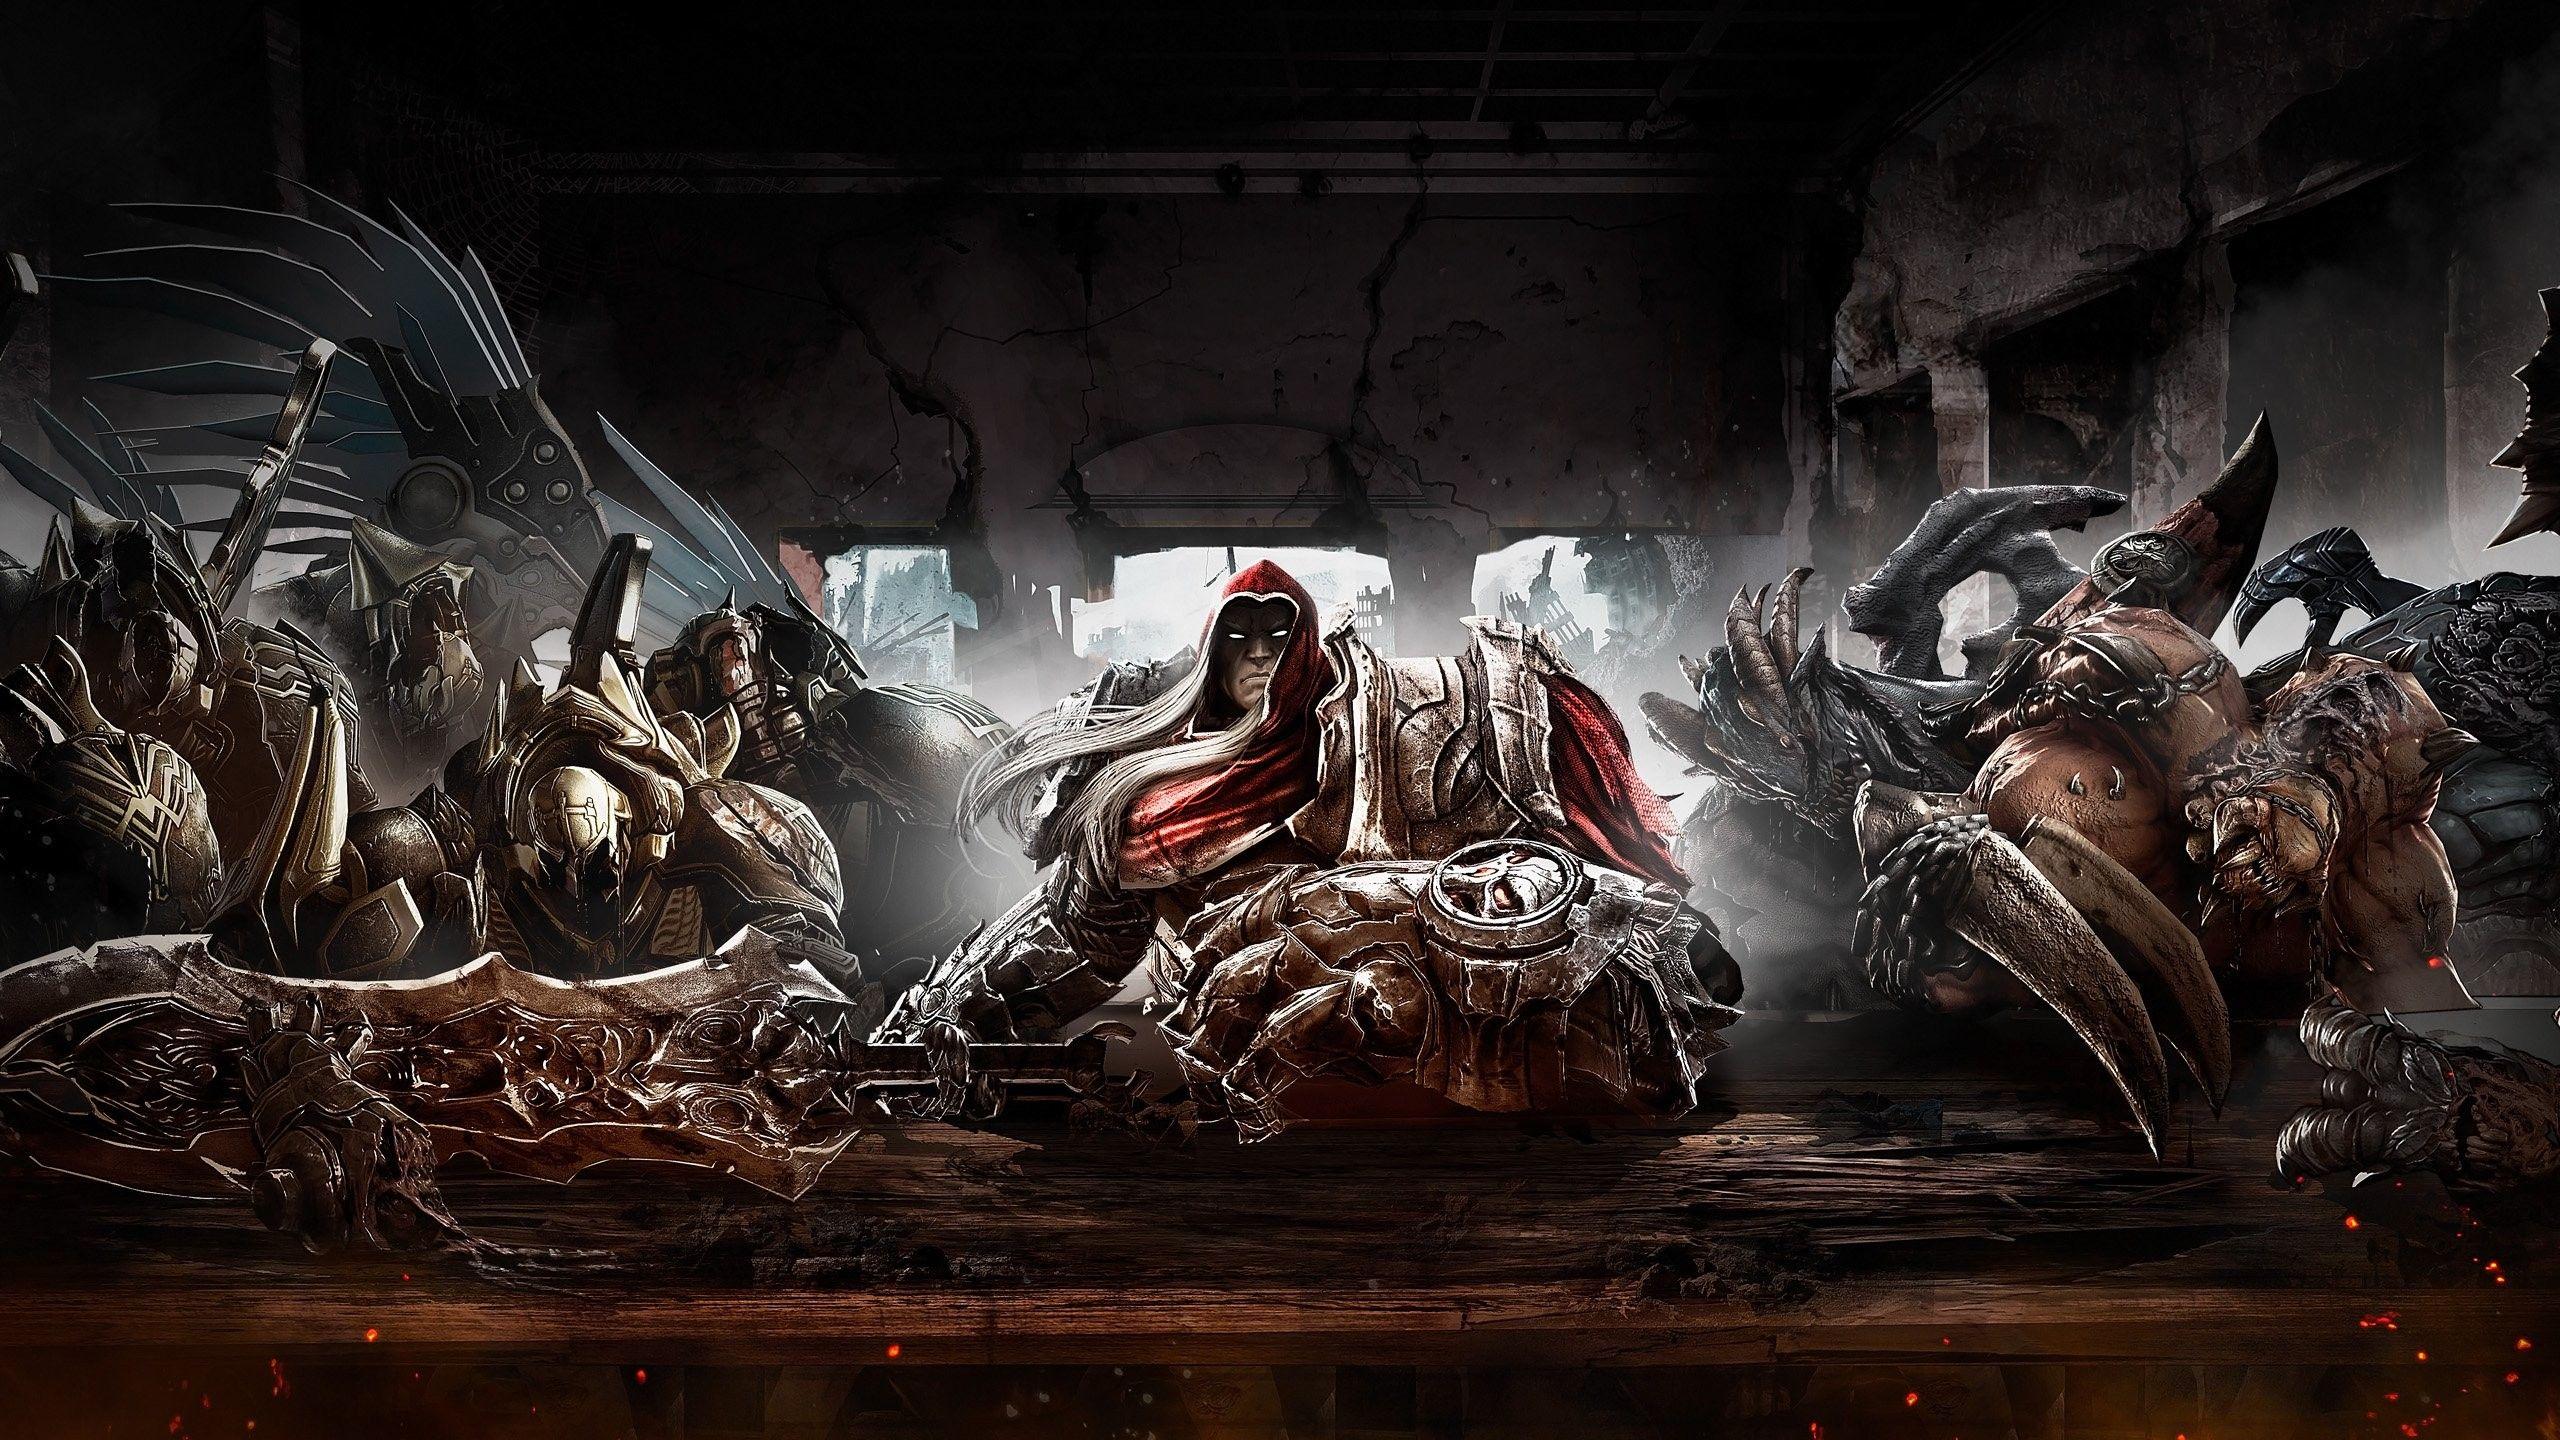 Darksiders War S Last Supper Gaming Wallpapers Hd Gaming Wallpapers Horsemen Of The Apocalypse